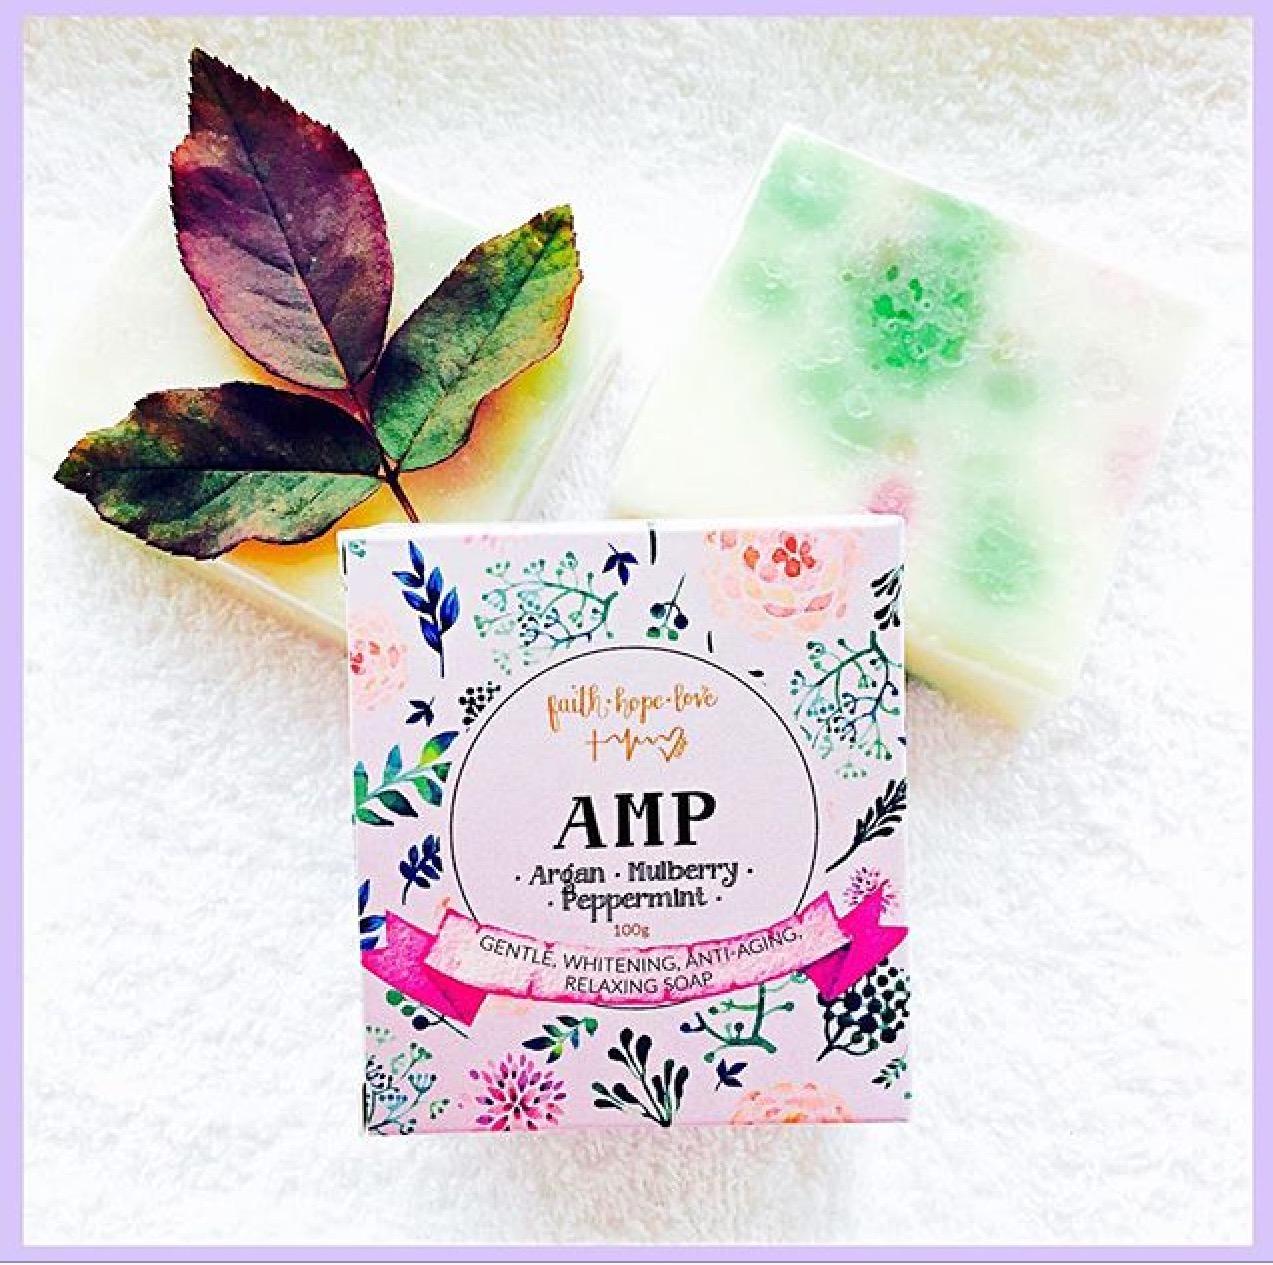 FaithHopeLove AMP soap (Argan Mulberry Peppermint) pure vegan glycerin soap